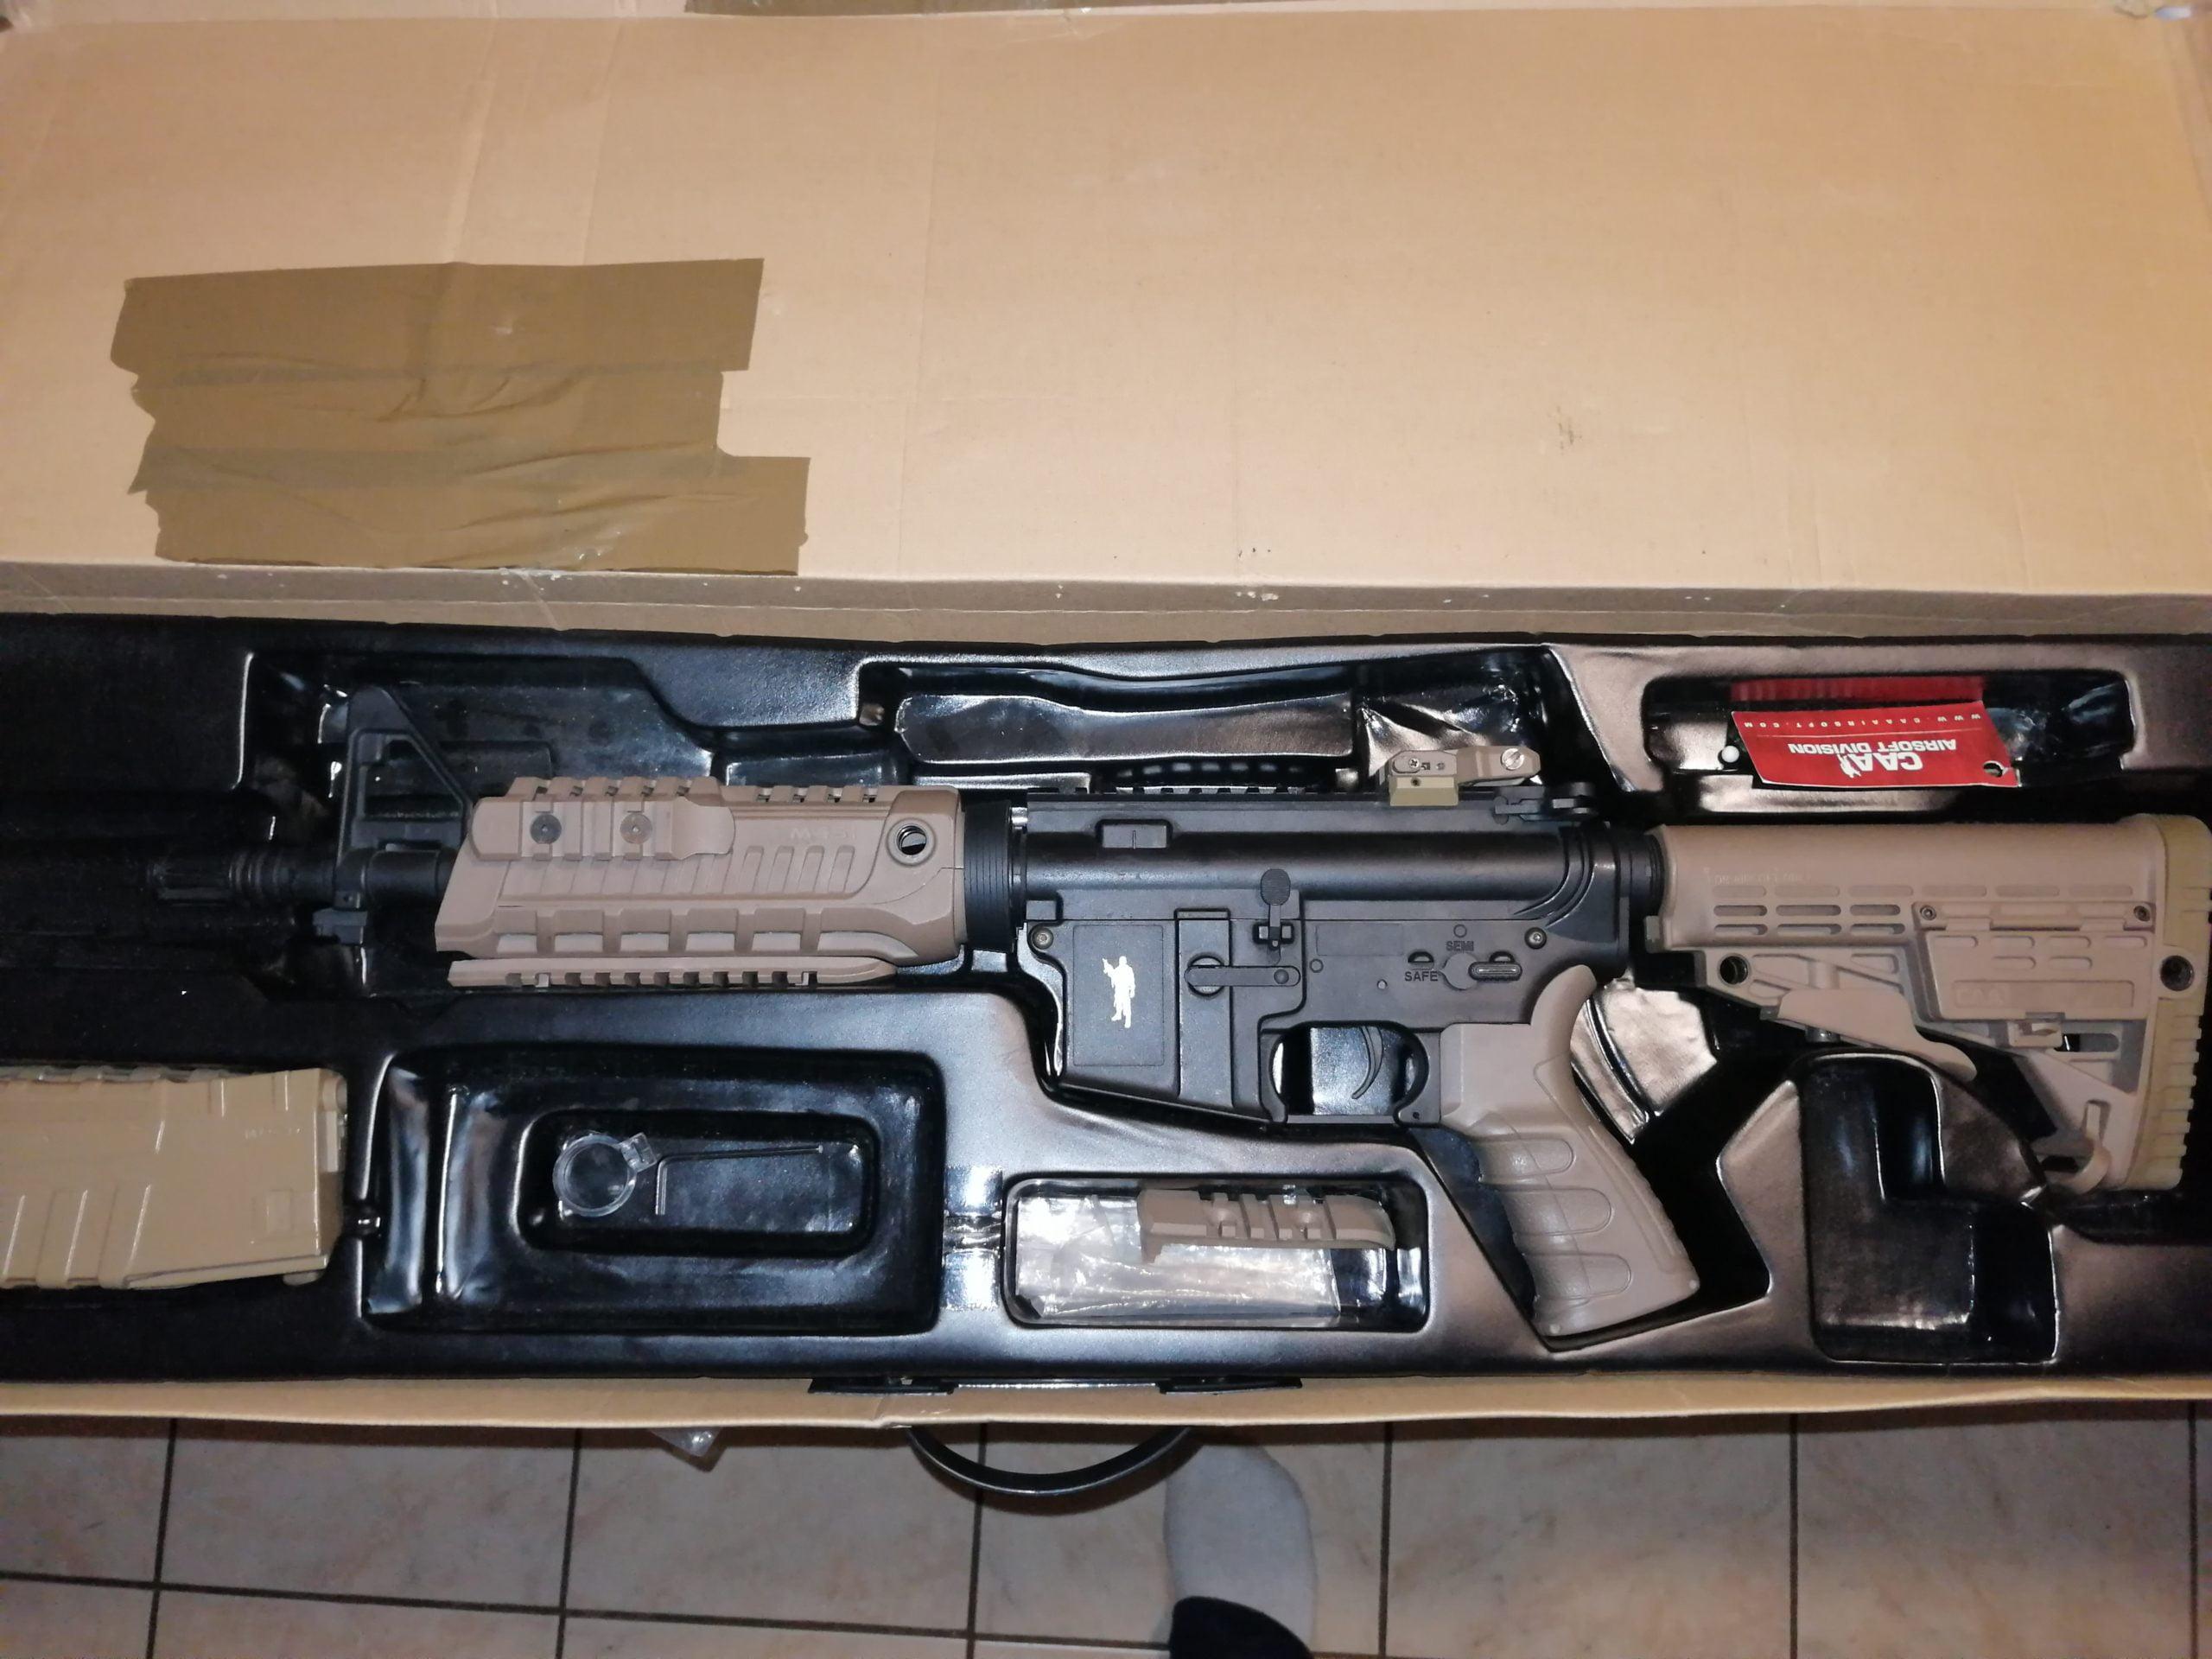 M4S1 Sporline CAA King Arms Tan